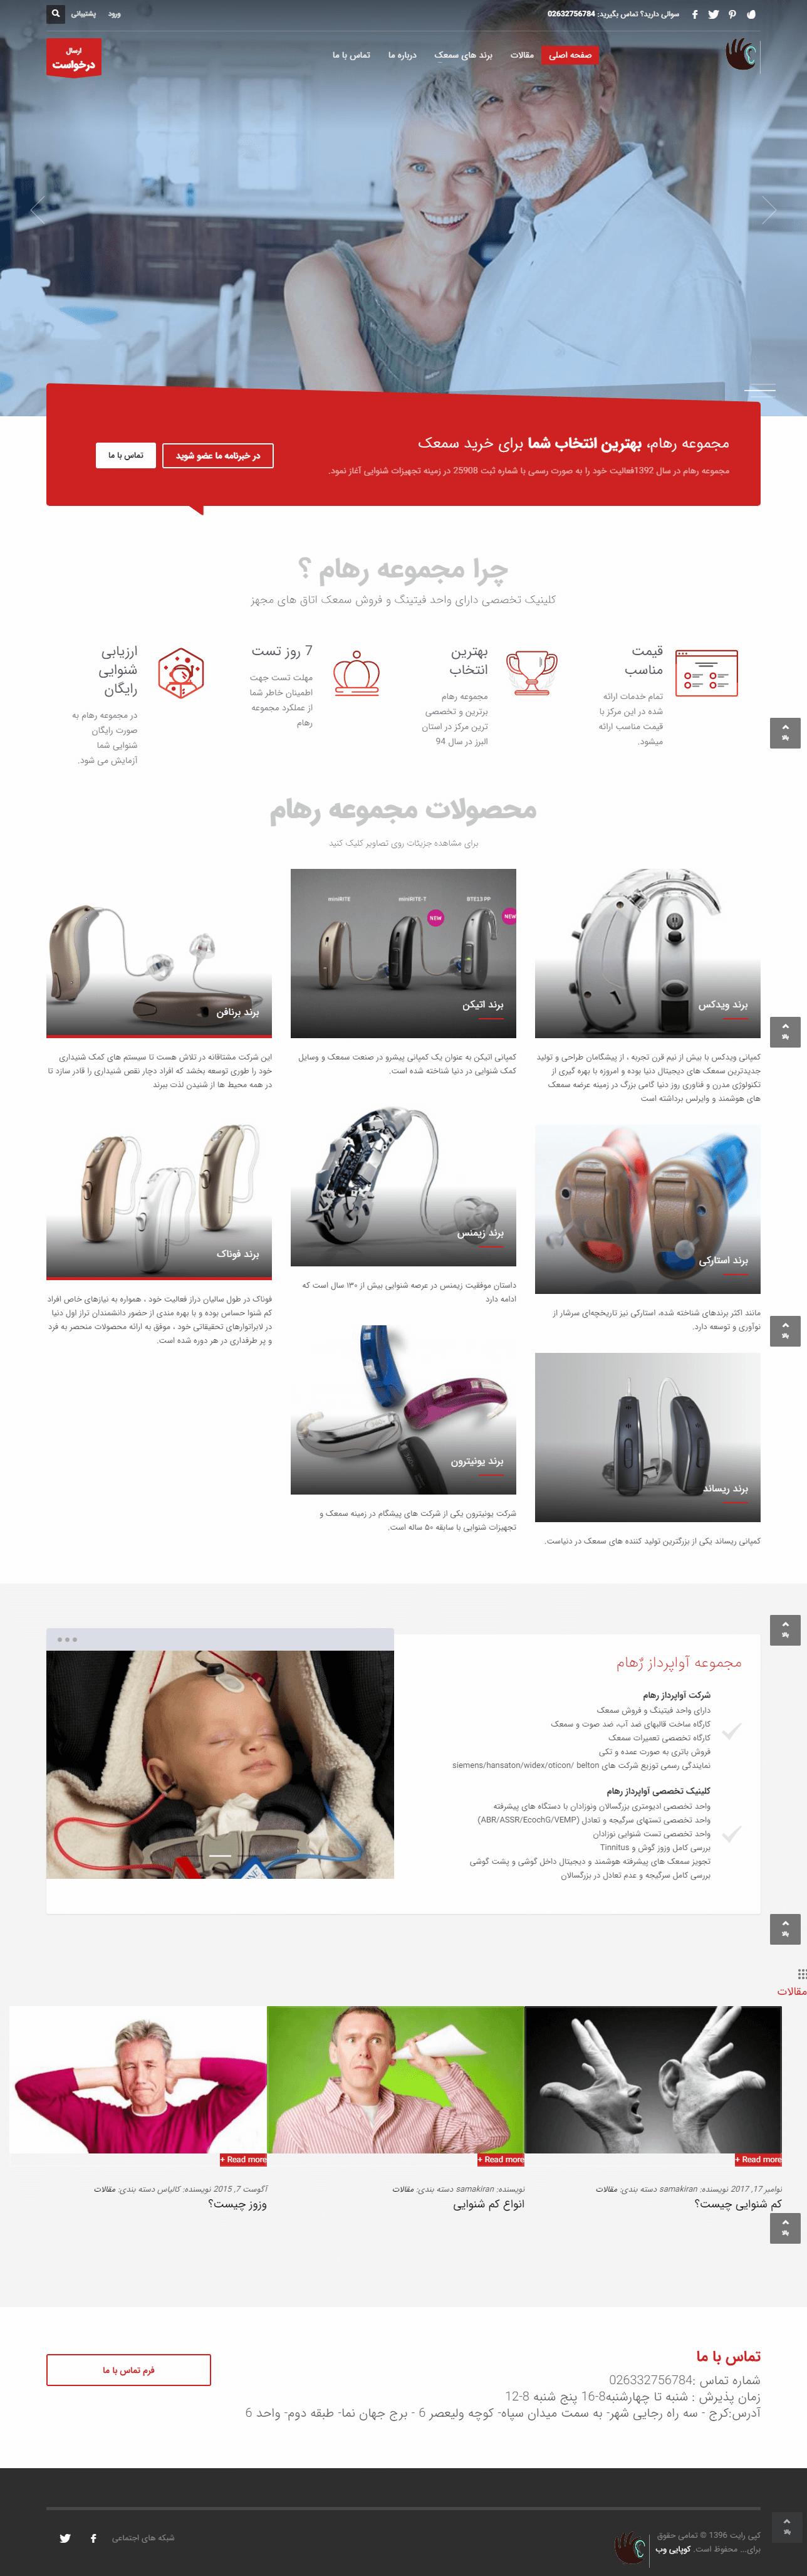 طراحی سایت سمعک رهام